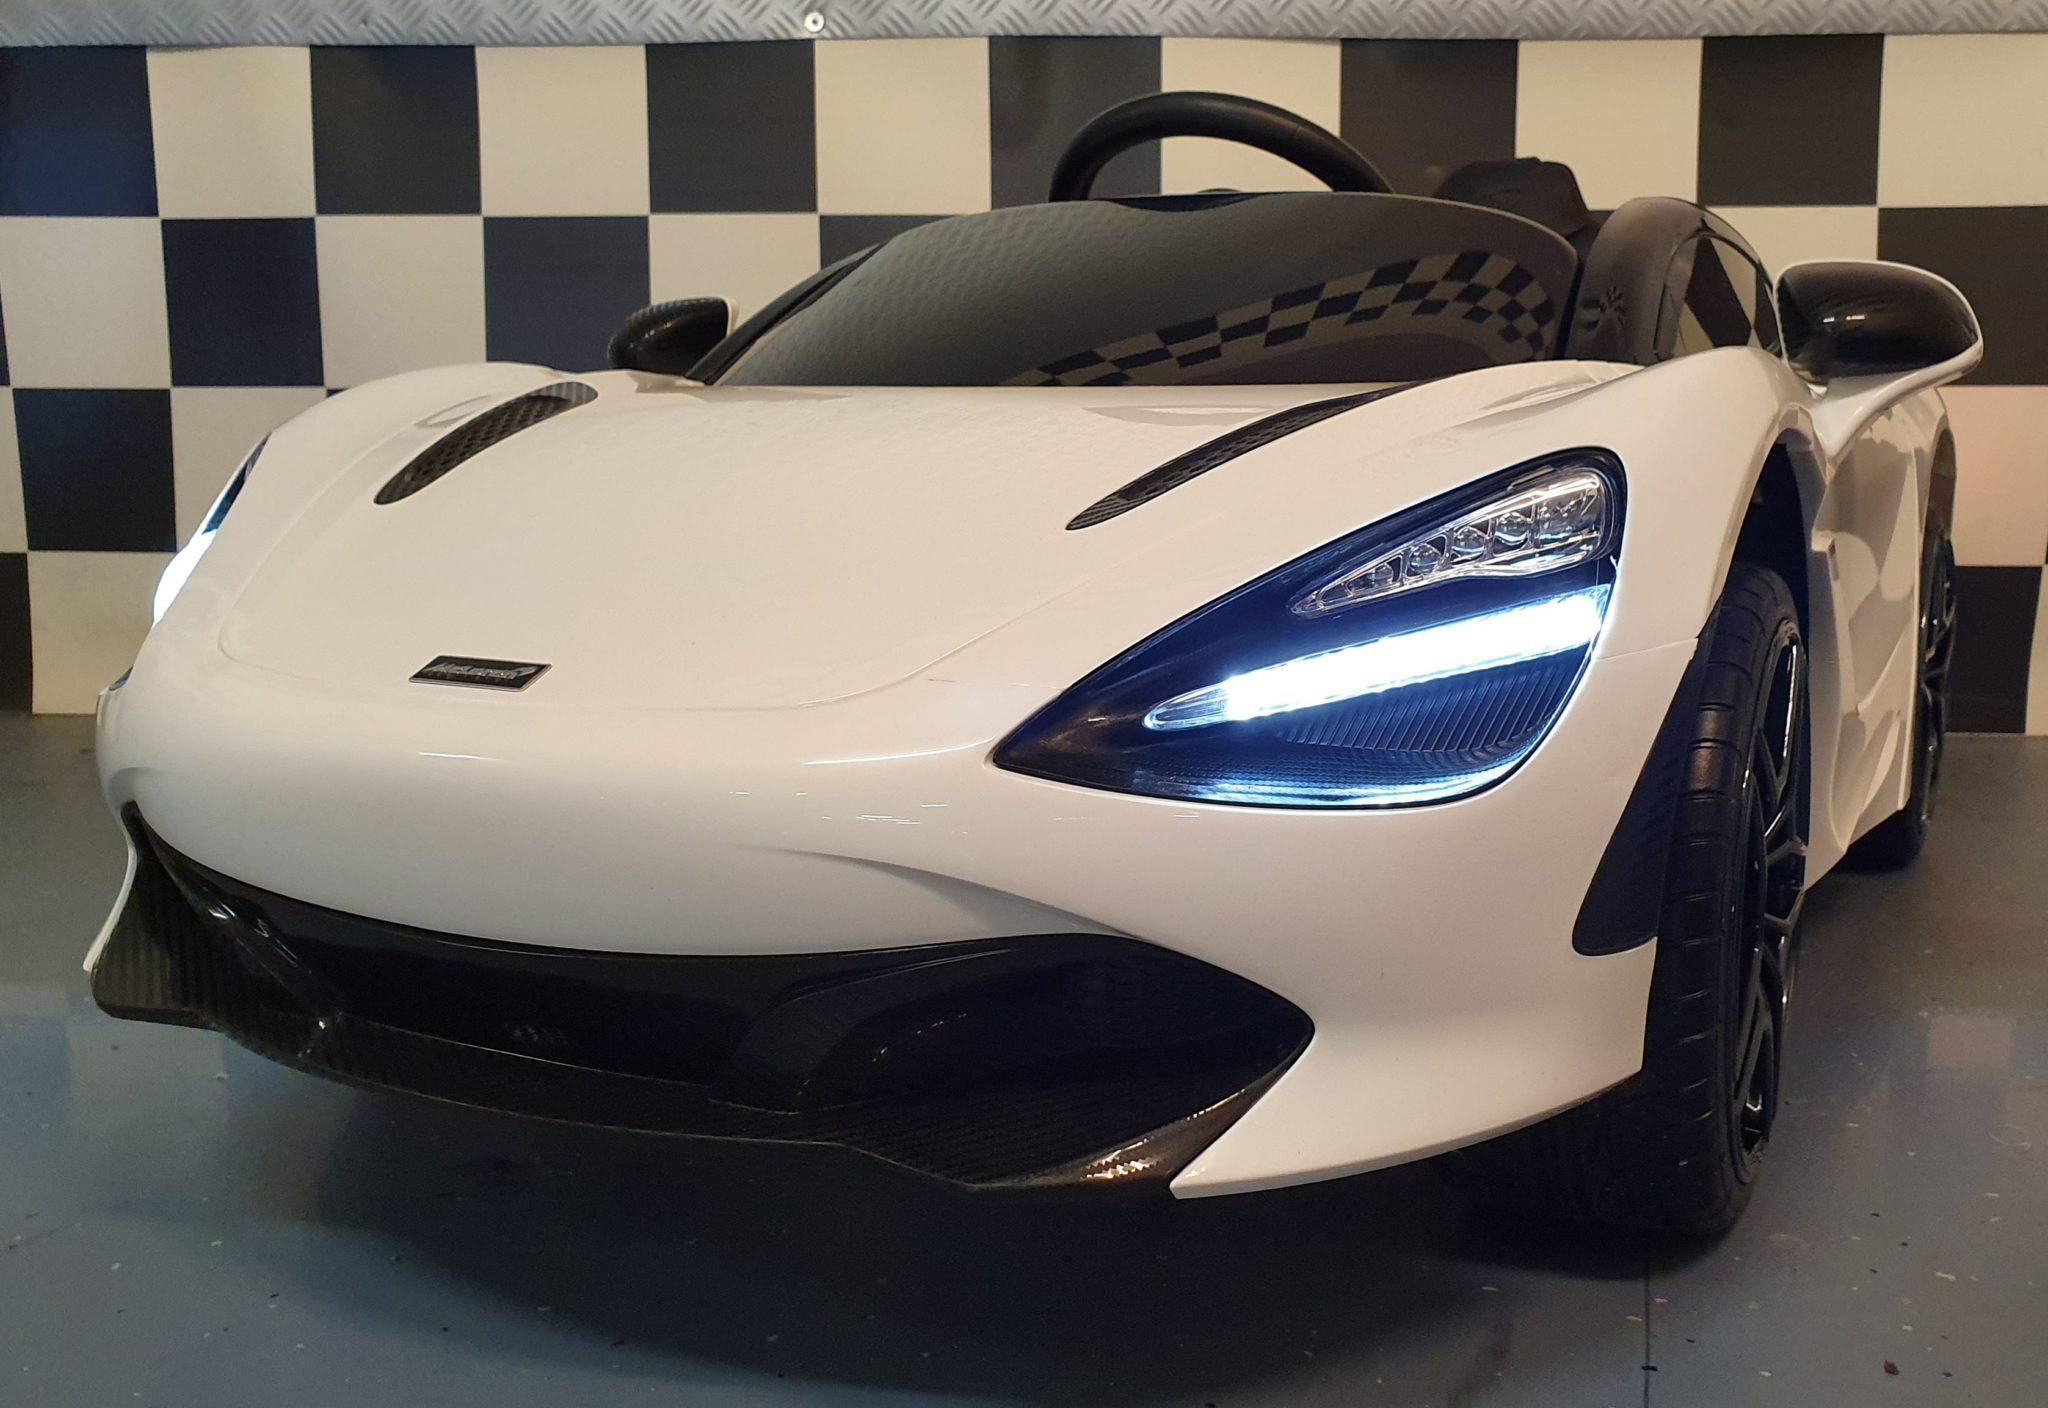 Kinderauto McLaren 720S elektrische accu kinderauto 12V 2.4G RC wit